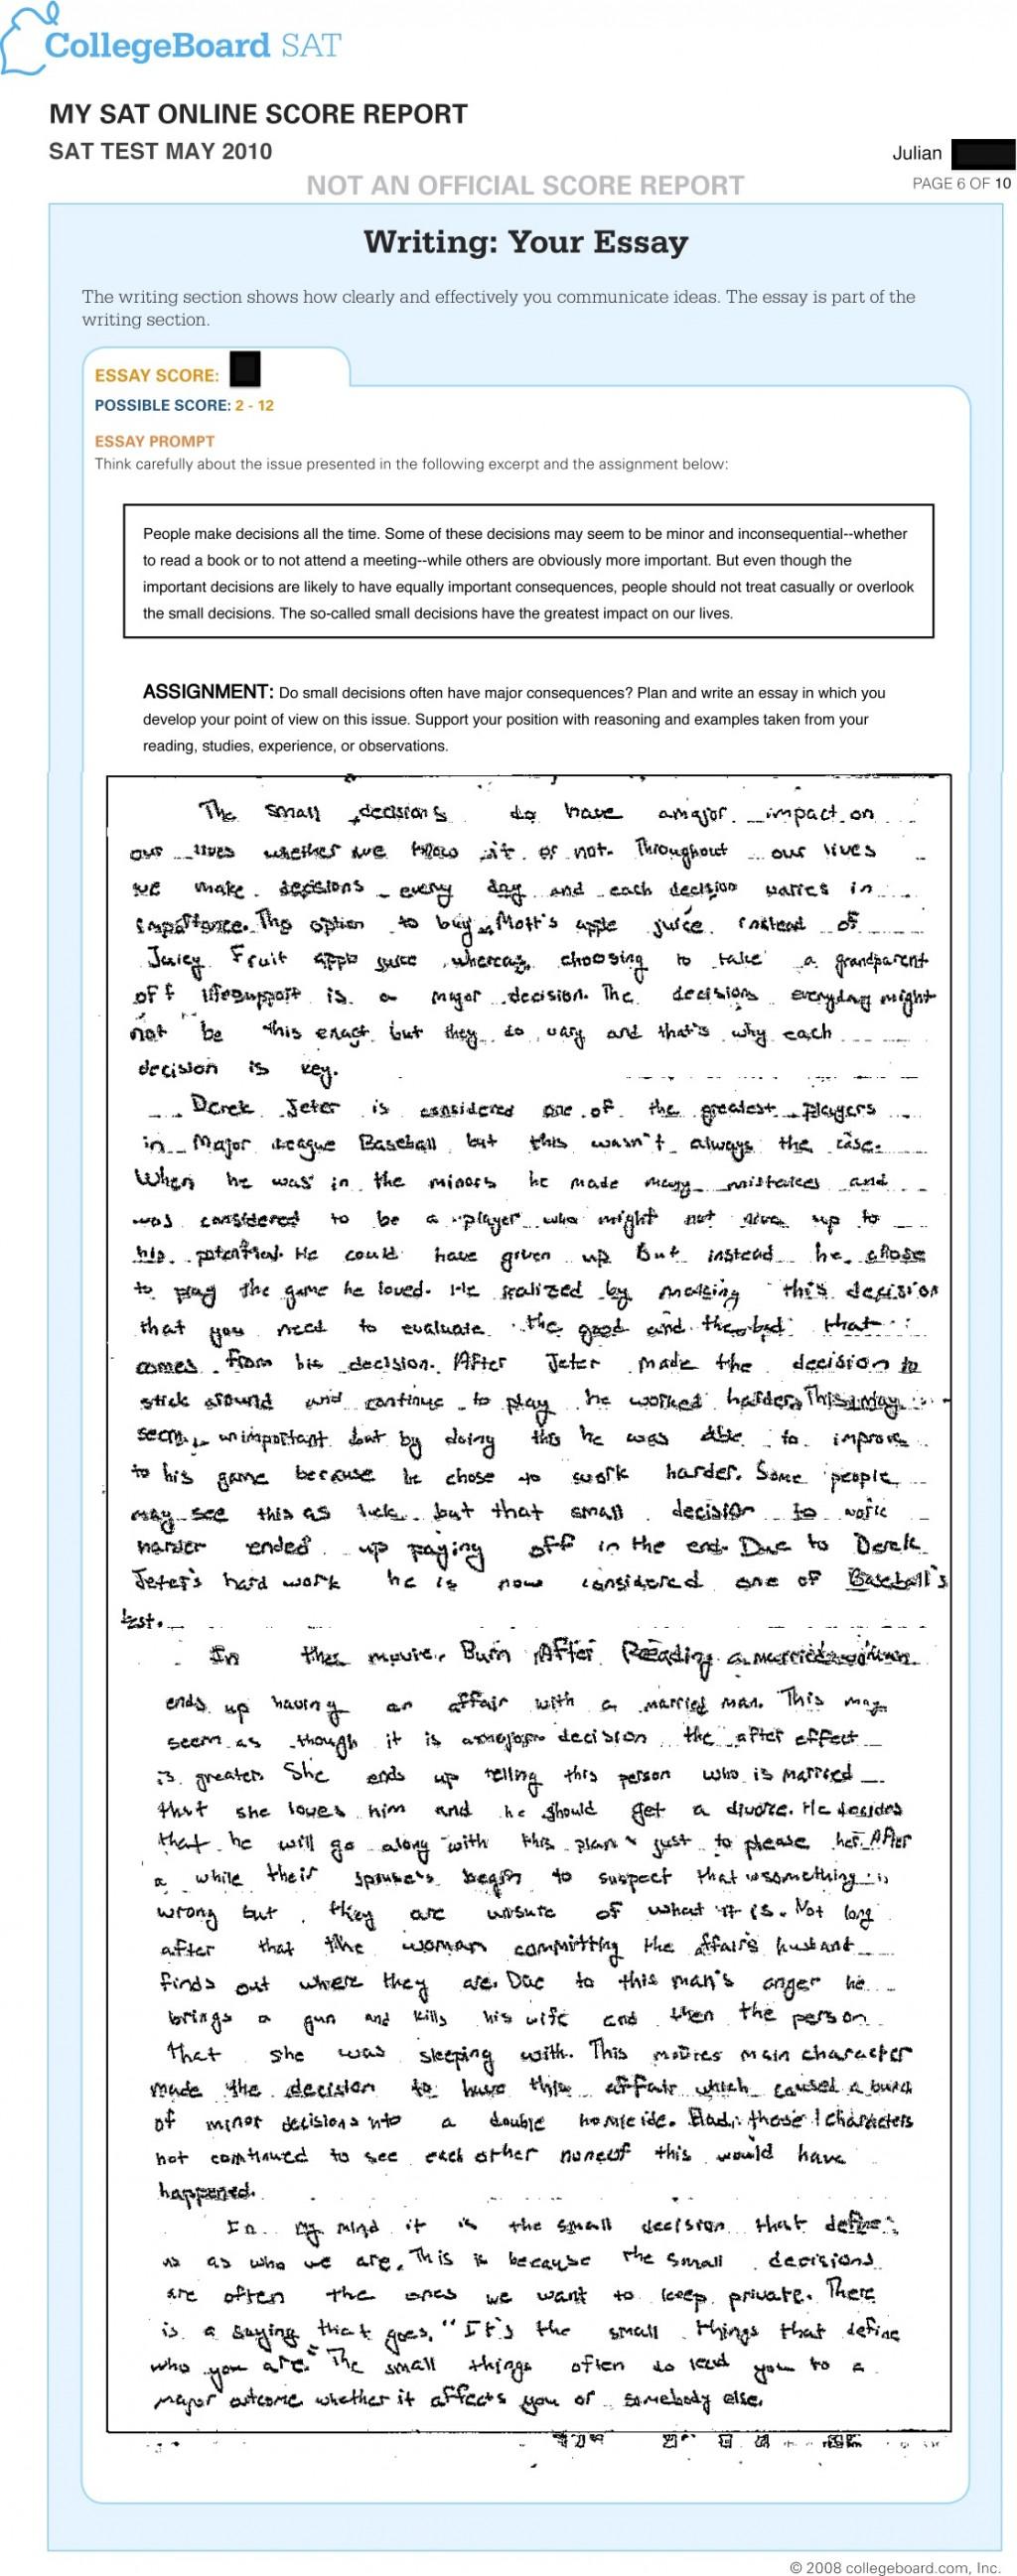 003 Essay Example Jr May Sat Amazing Scoring Score Percentiles 2017 Examples 6 2018 Large